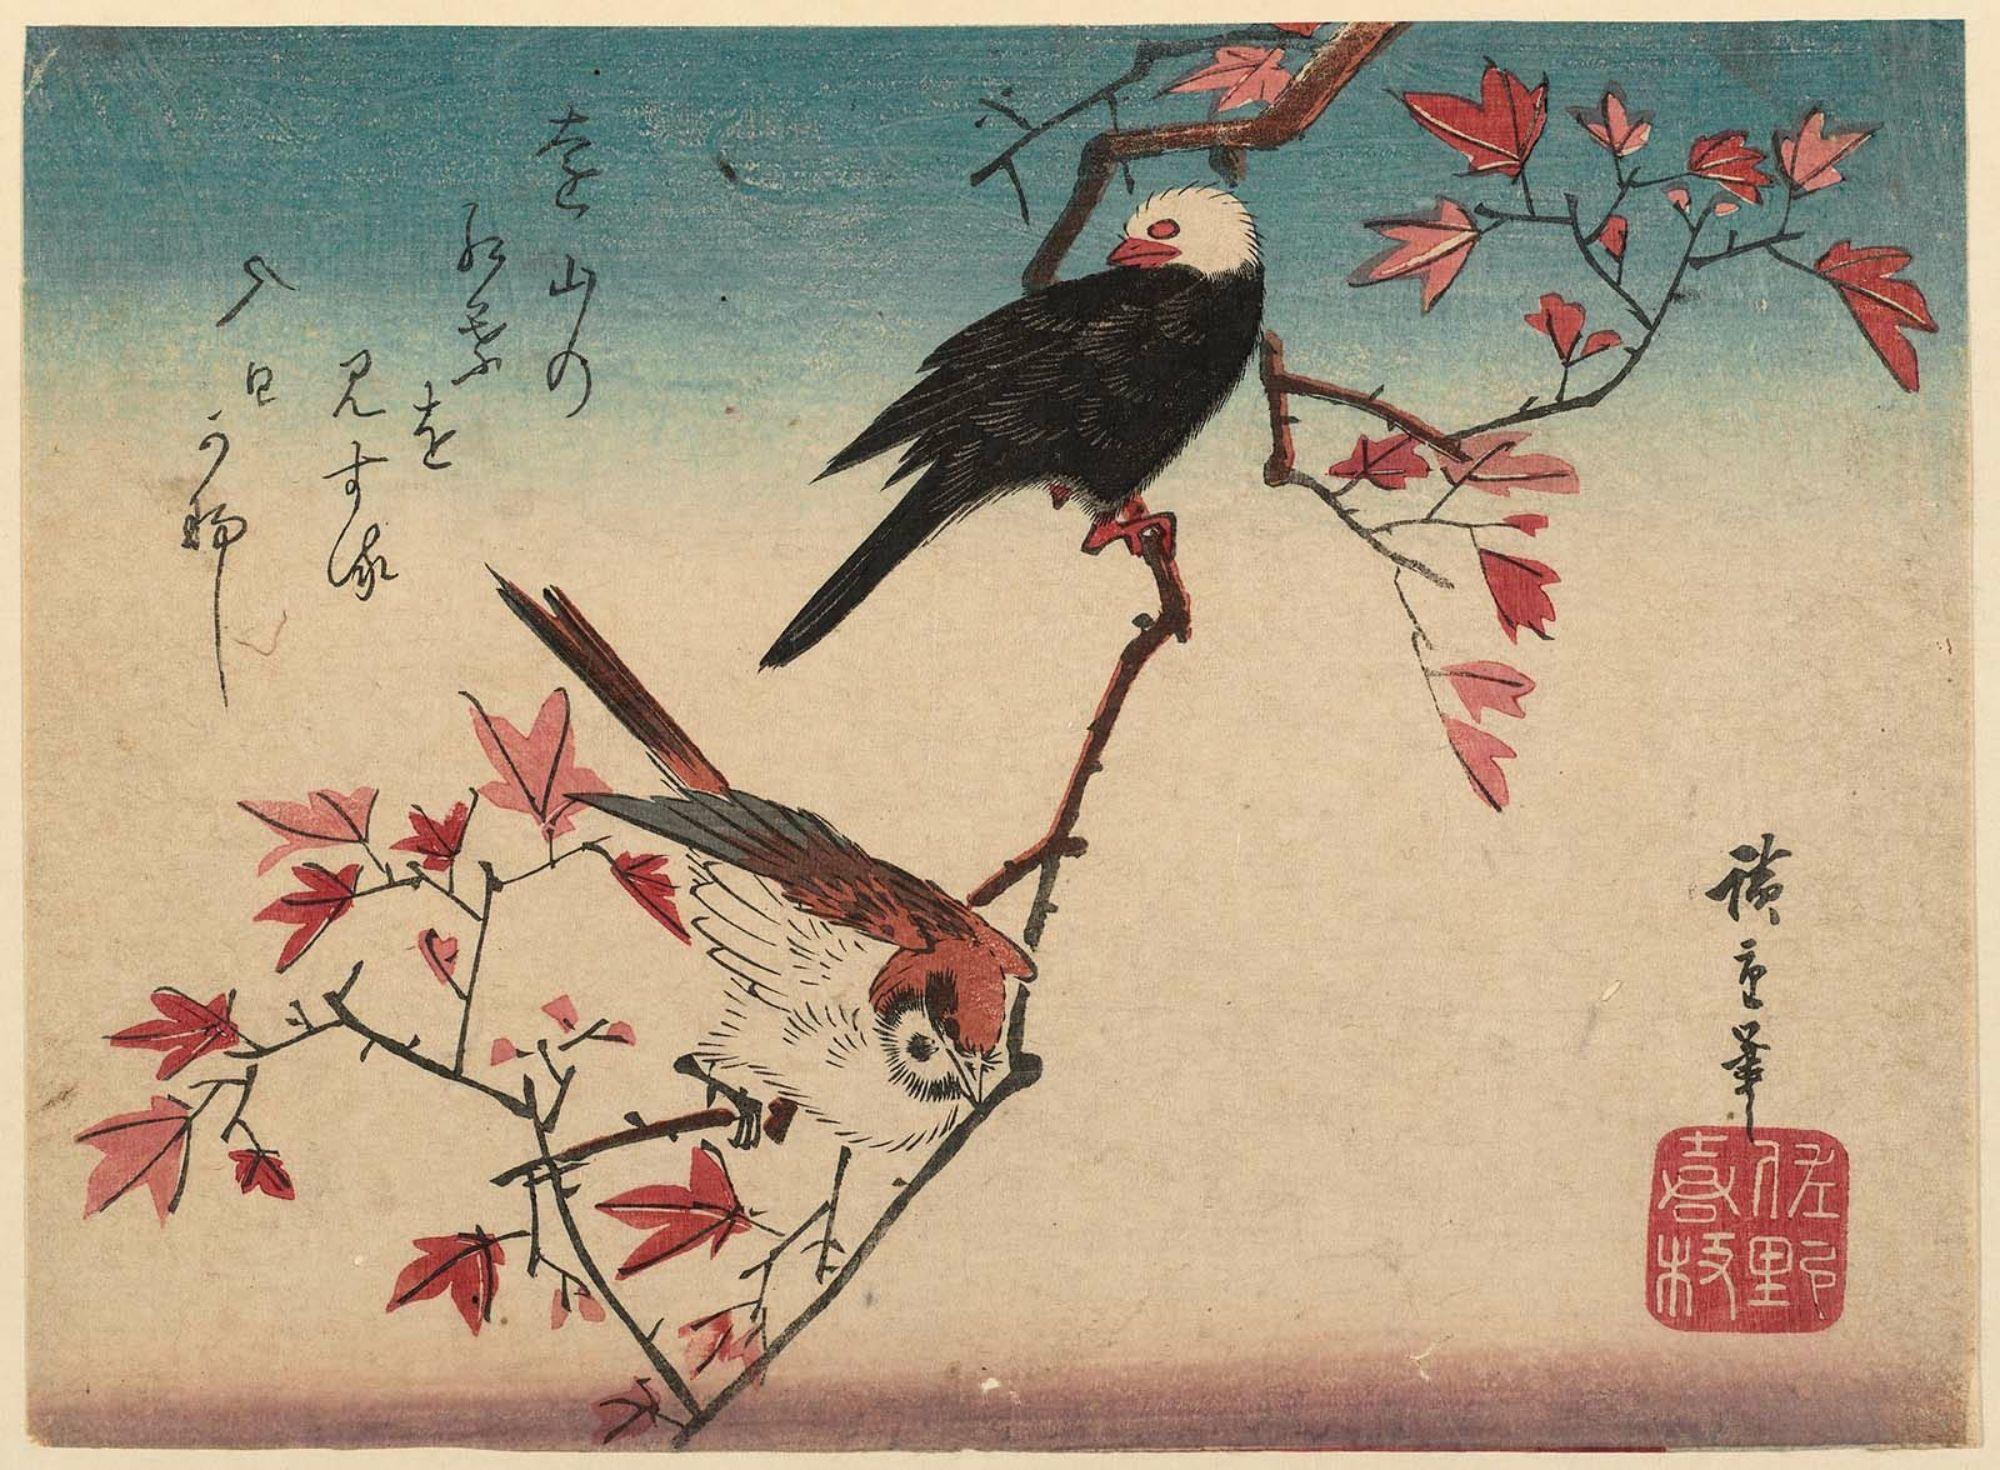 Utagawa Hiroshige: Sparrow and White-headed Bird on Maple